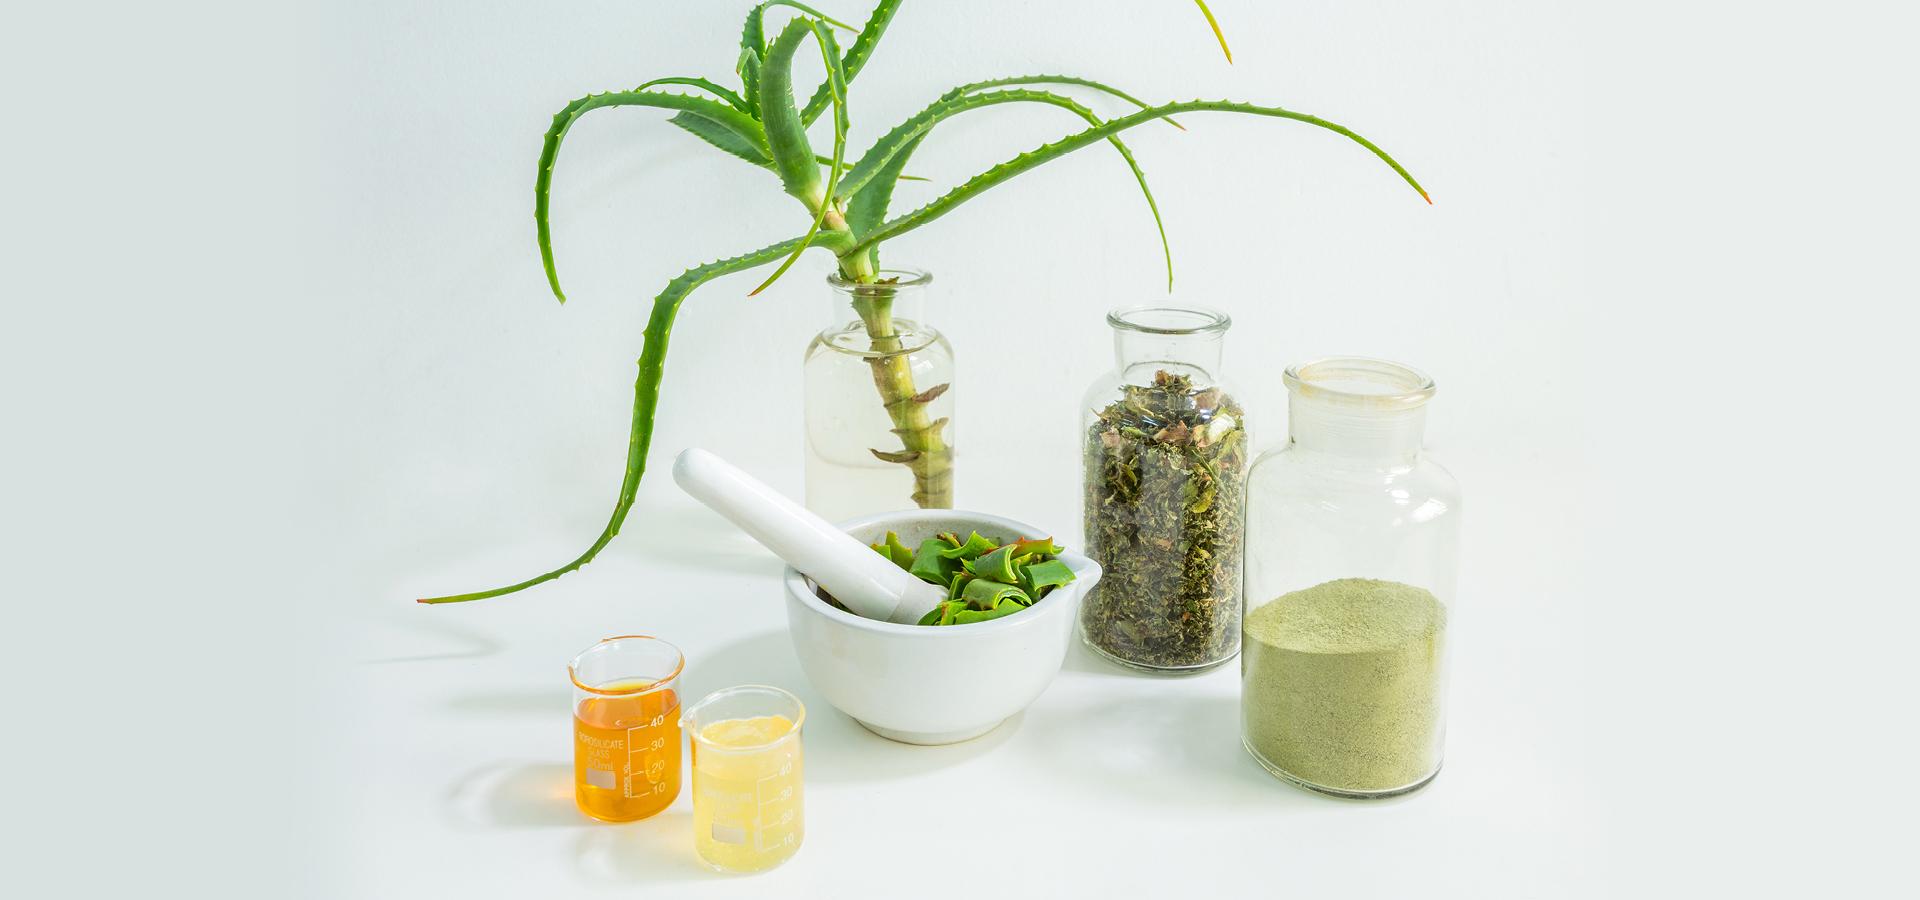 afrigetics-botanicals-aloe-arborescens